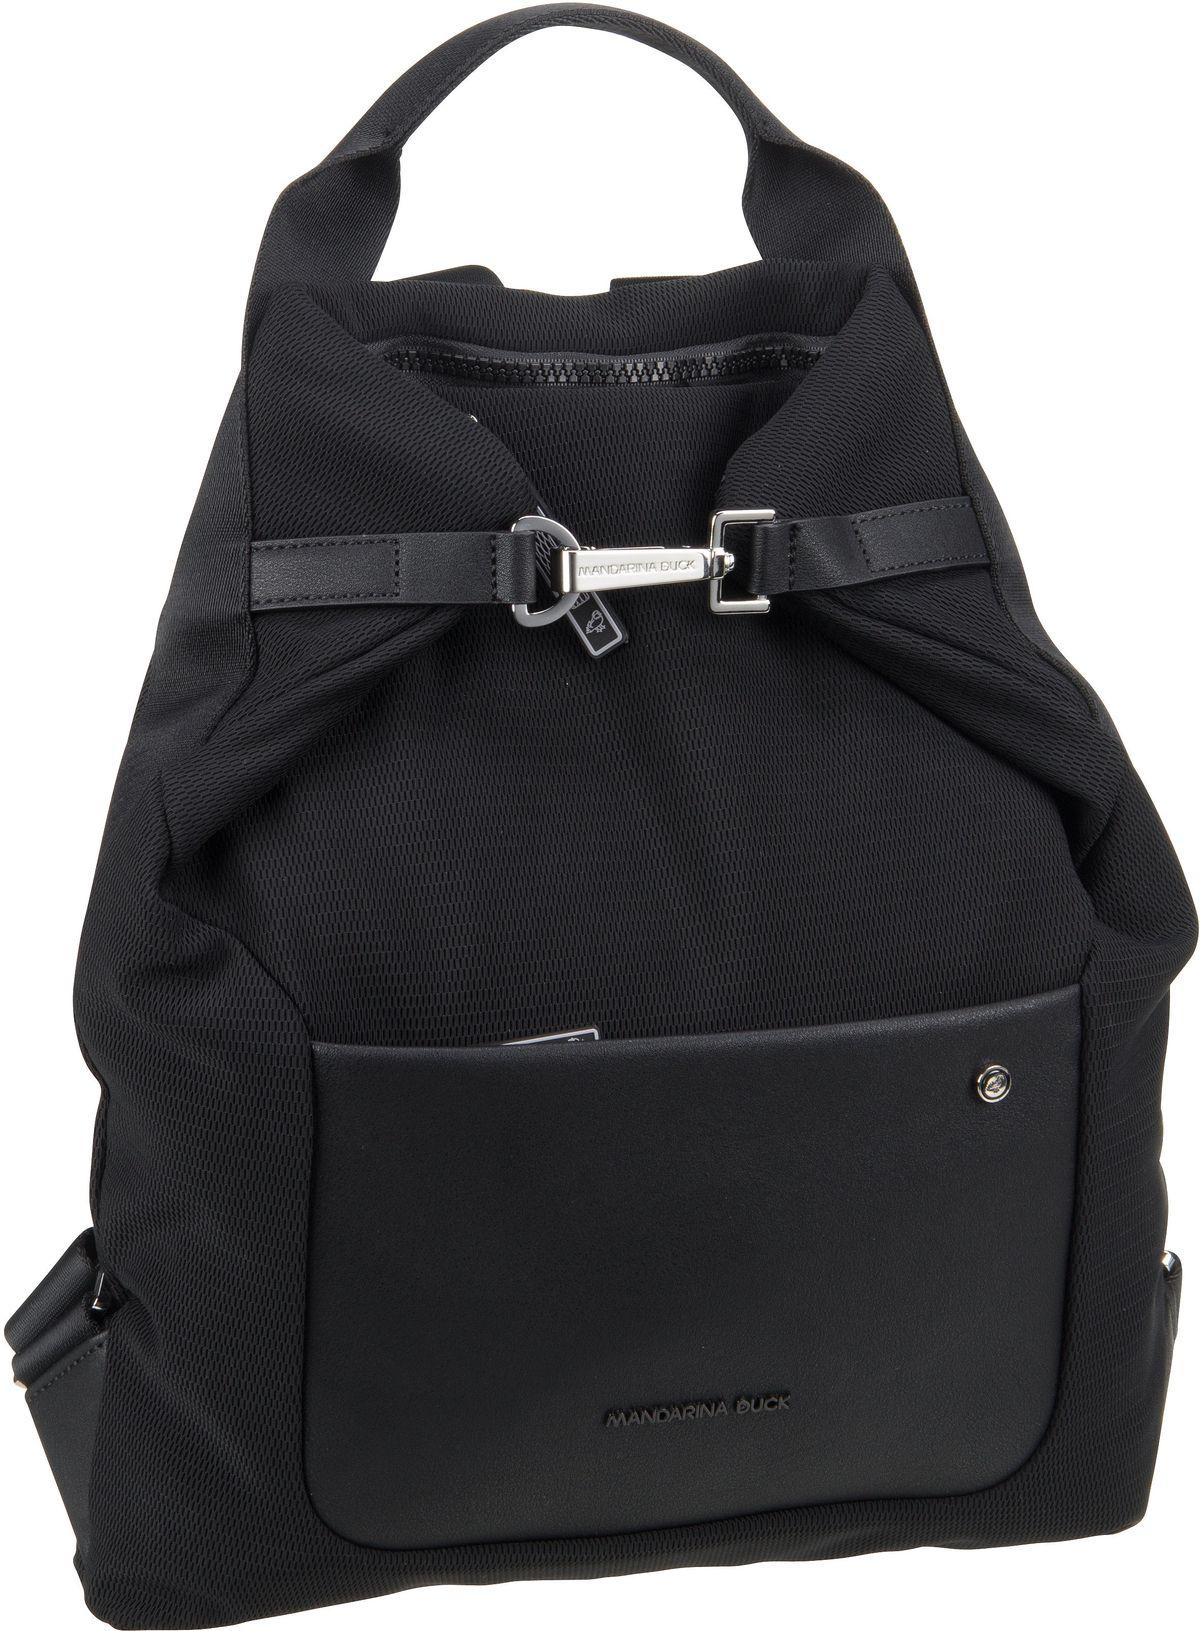 Rucksack / Daypack Camden Backpack VBT05 Black